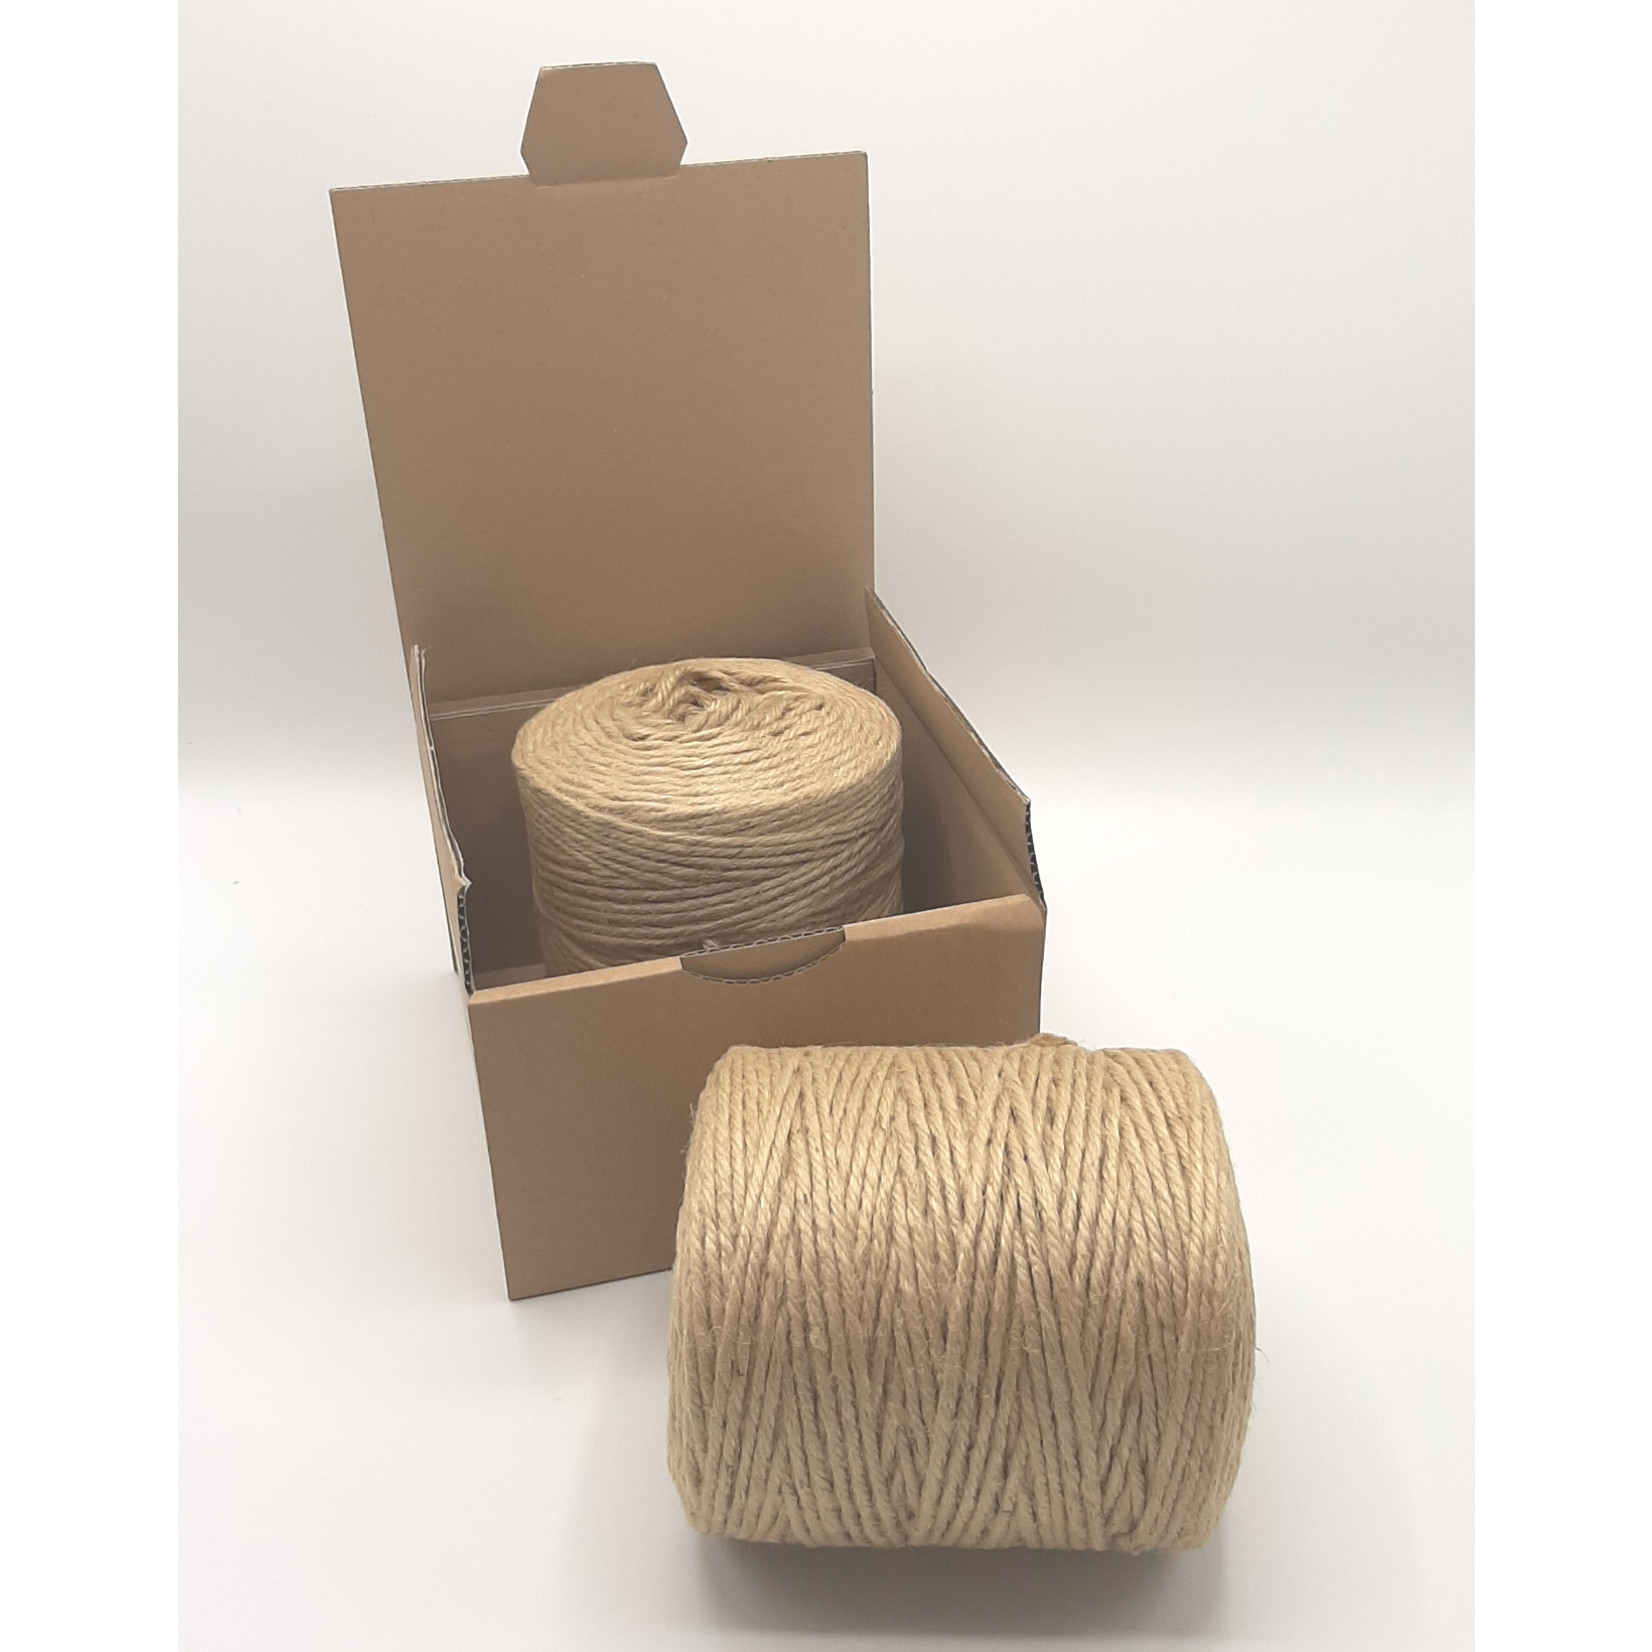 HollandWool Jute touw 500 gr. = 200 m. - kleur naturel - 2.5 mm. dik